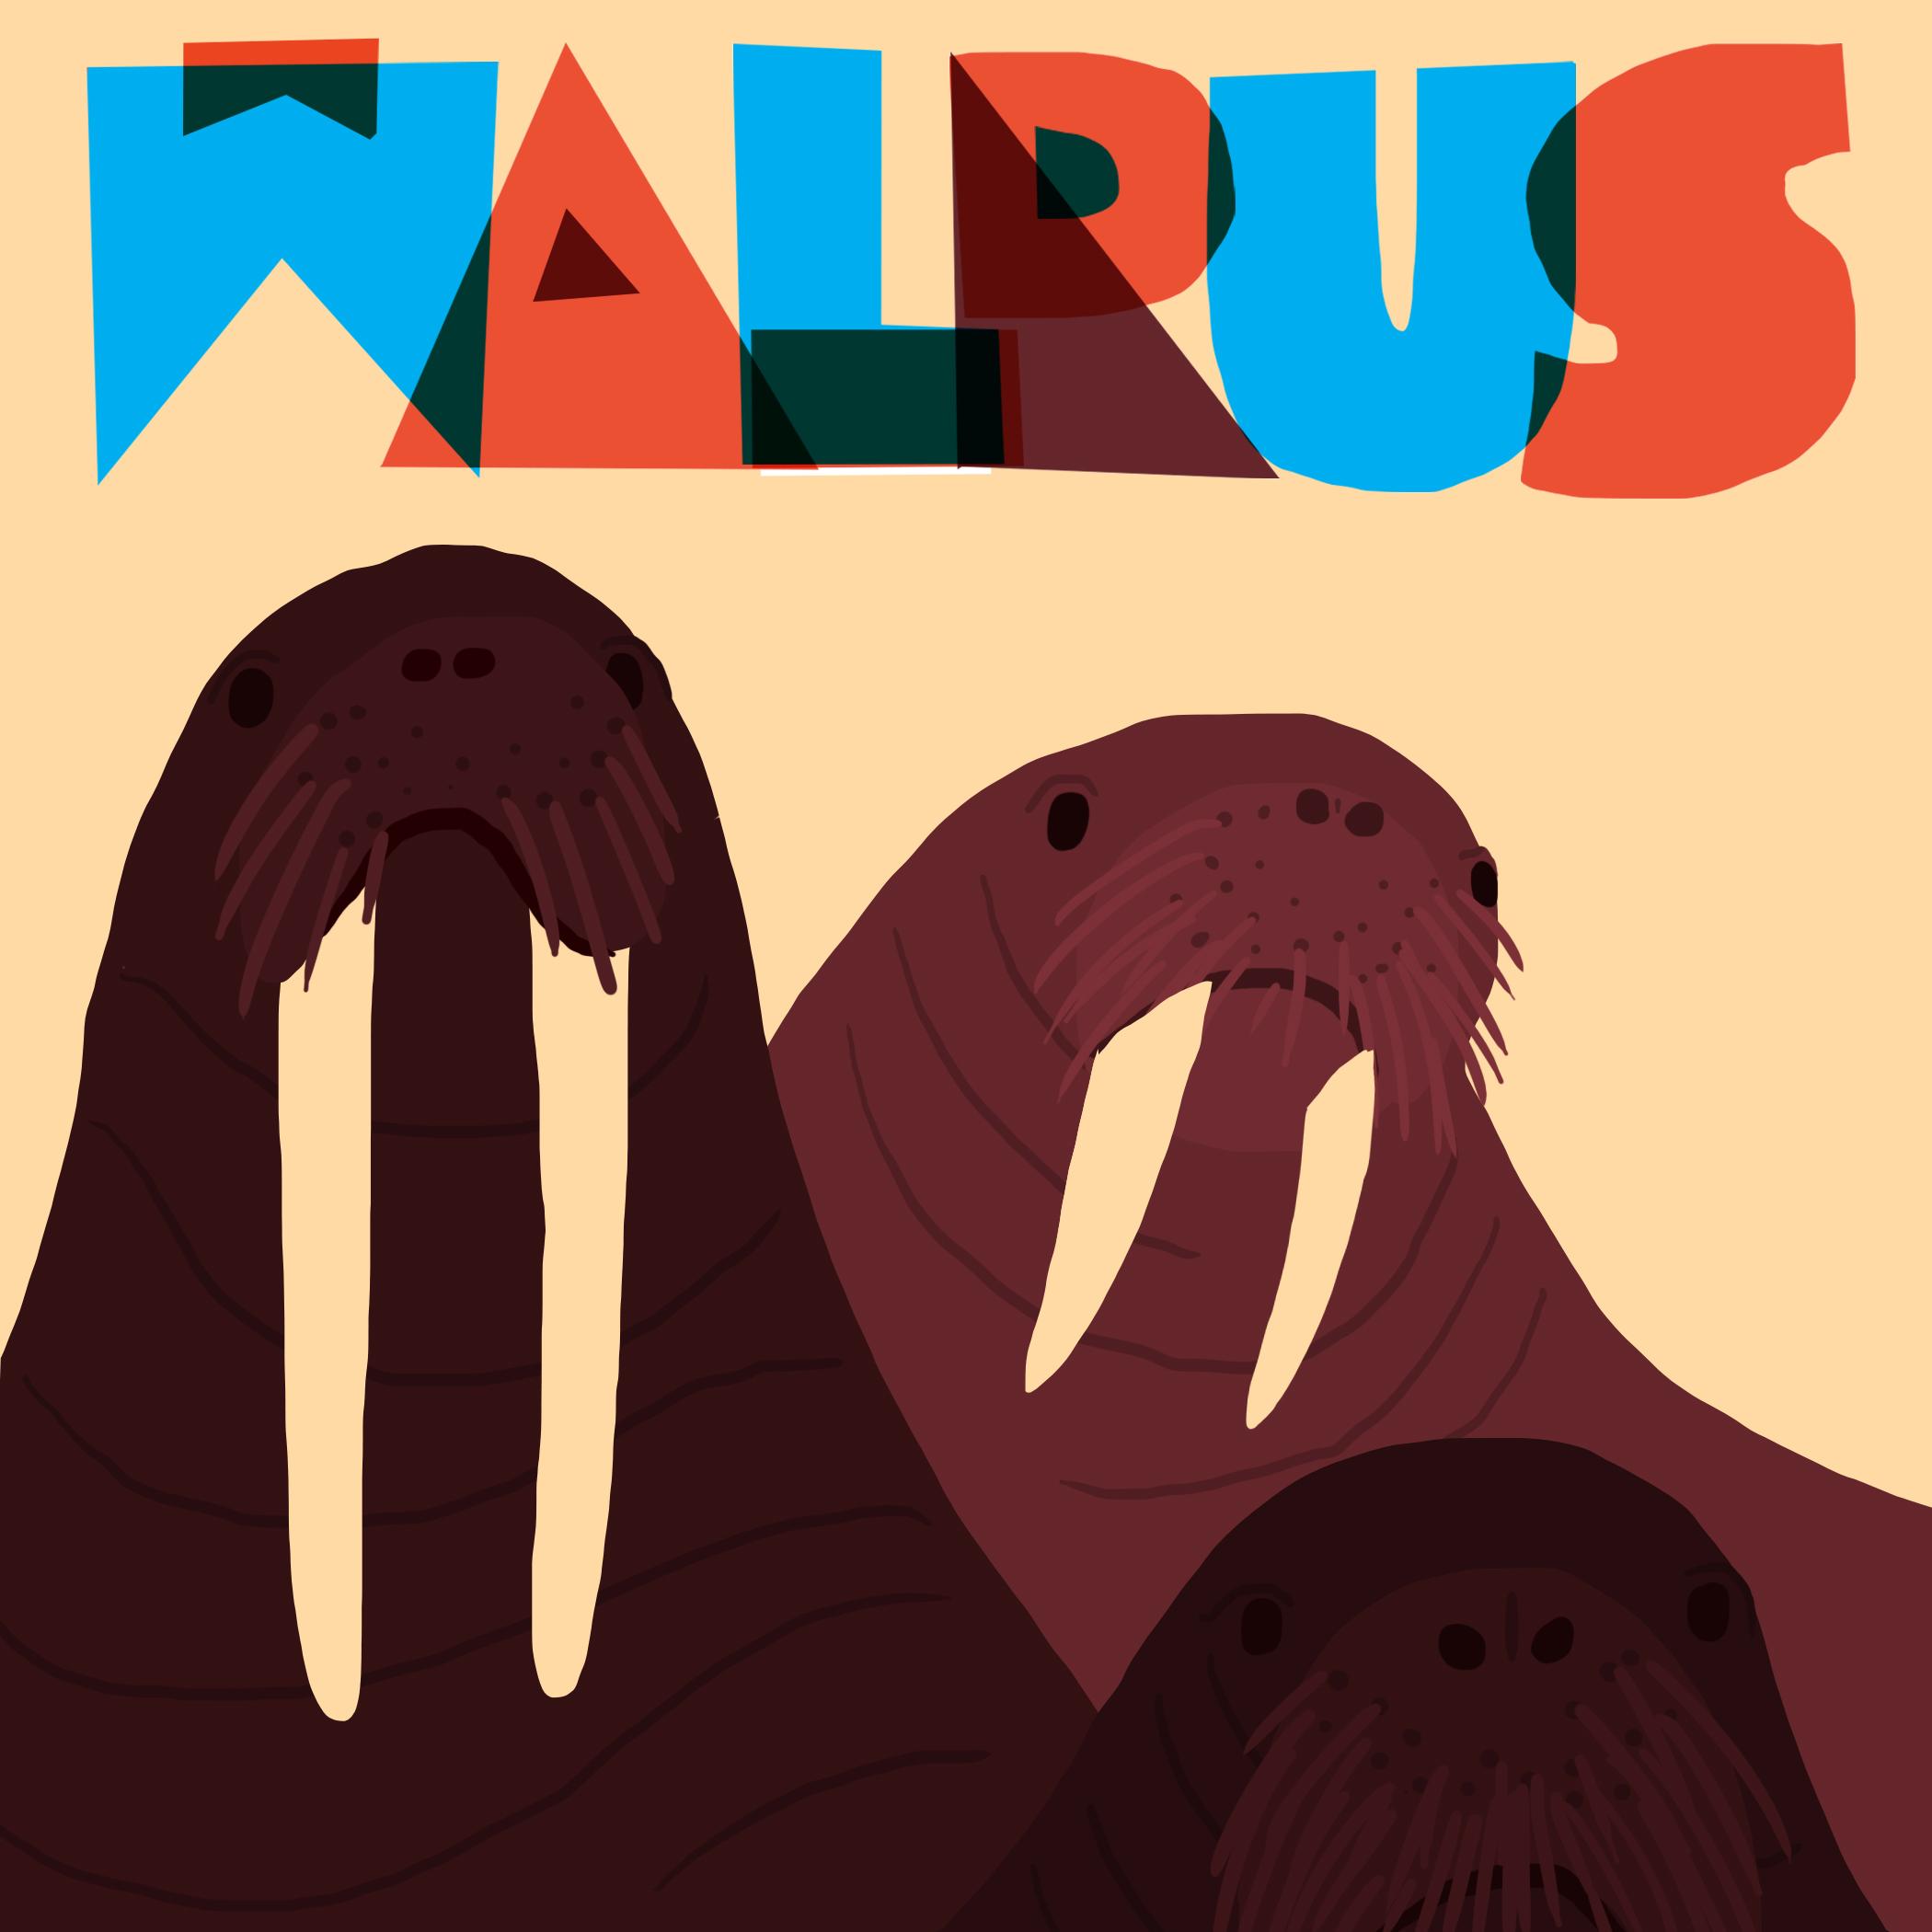 walrus social post.jpg